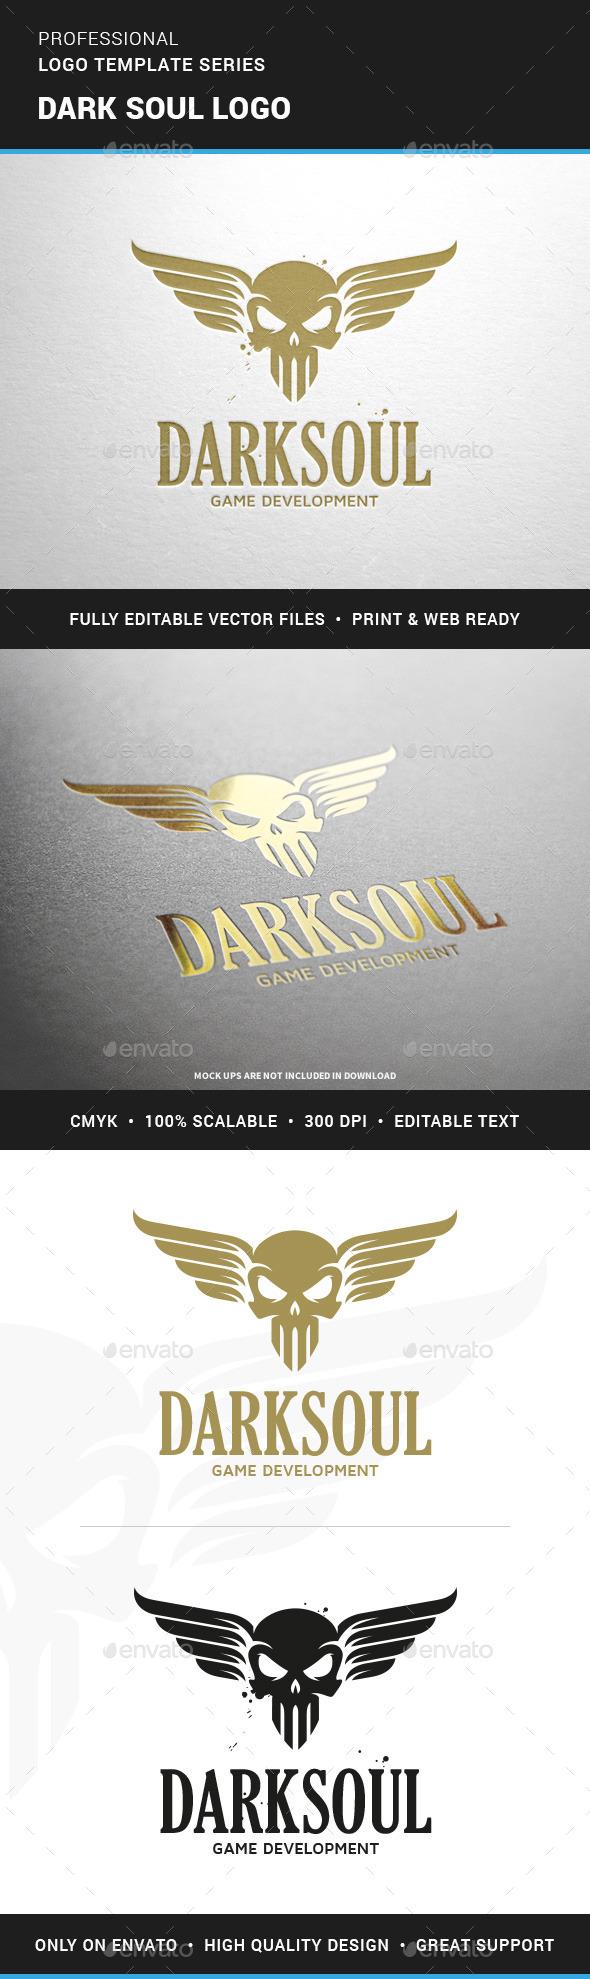 Dark Soul Logo Template - Logo Templates